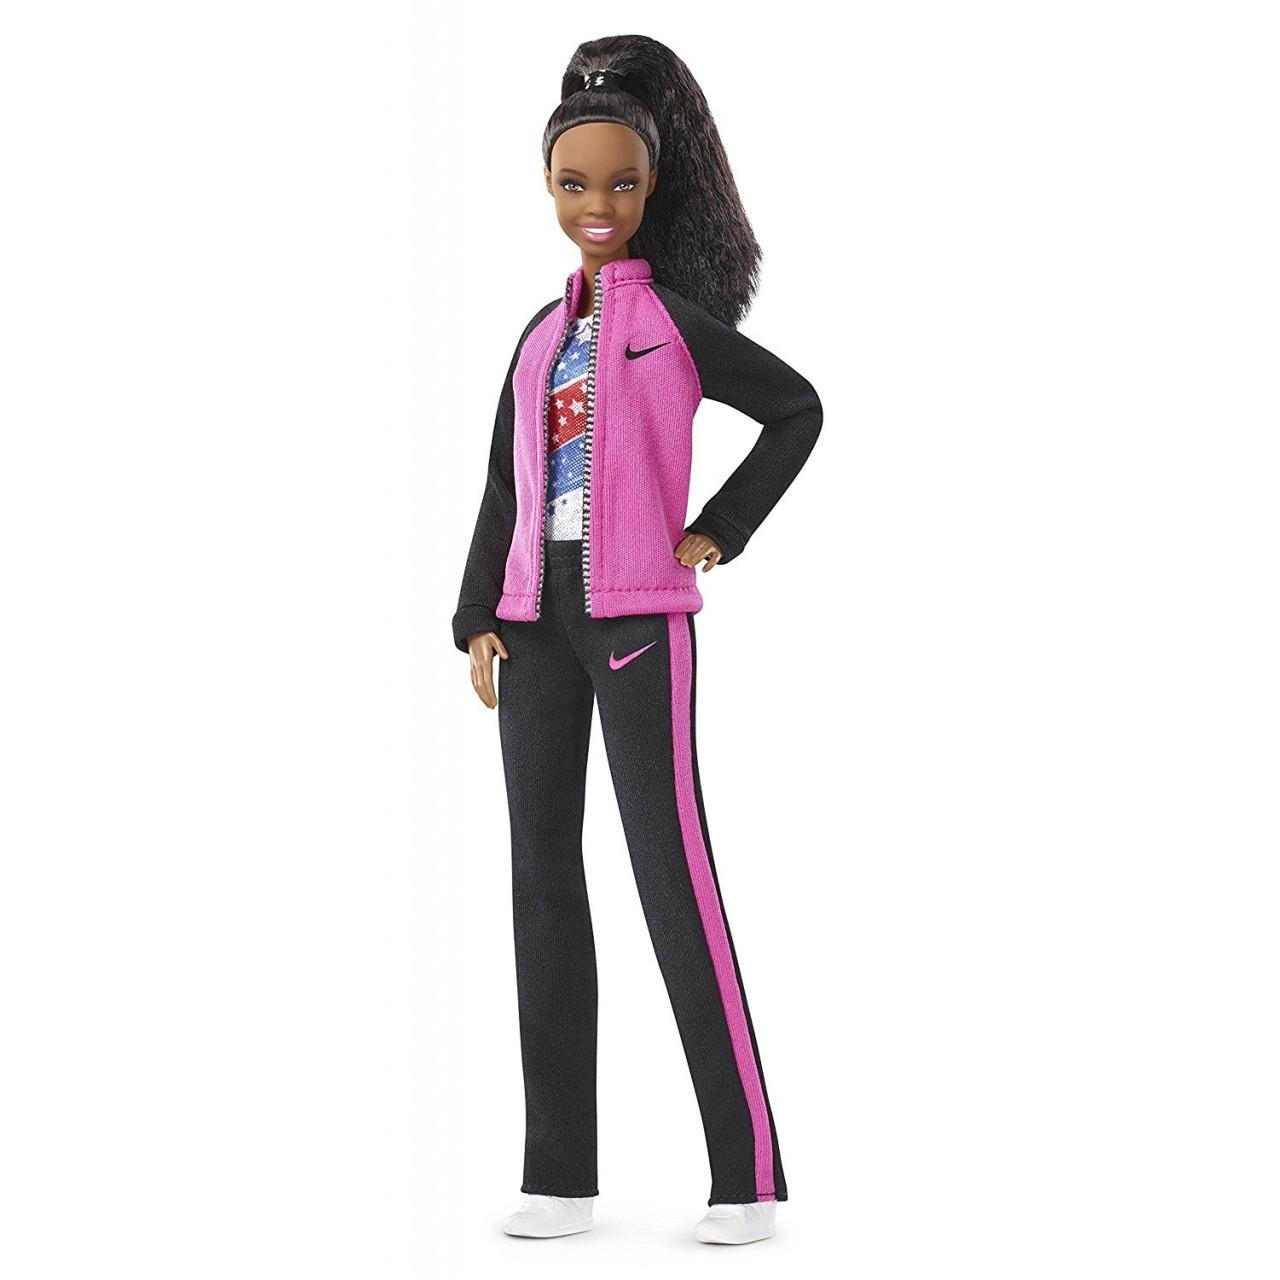 "Коллекционная кукла  Барби  «Габби» Дуглас, FGC34 ""Двигайся как я"""